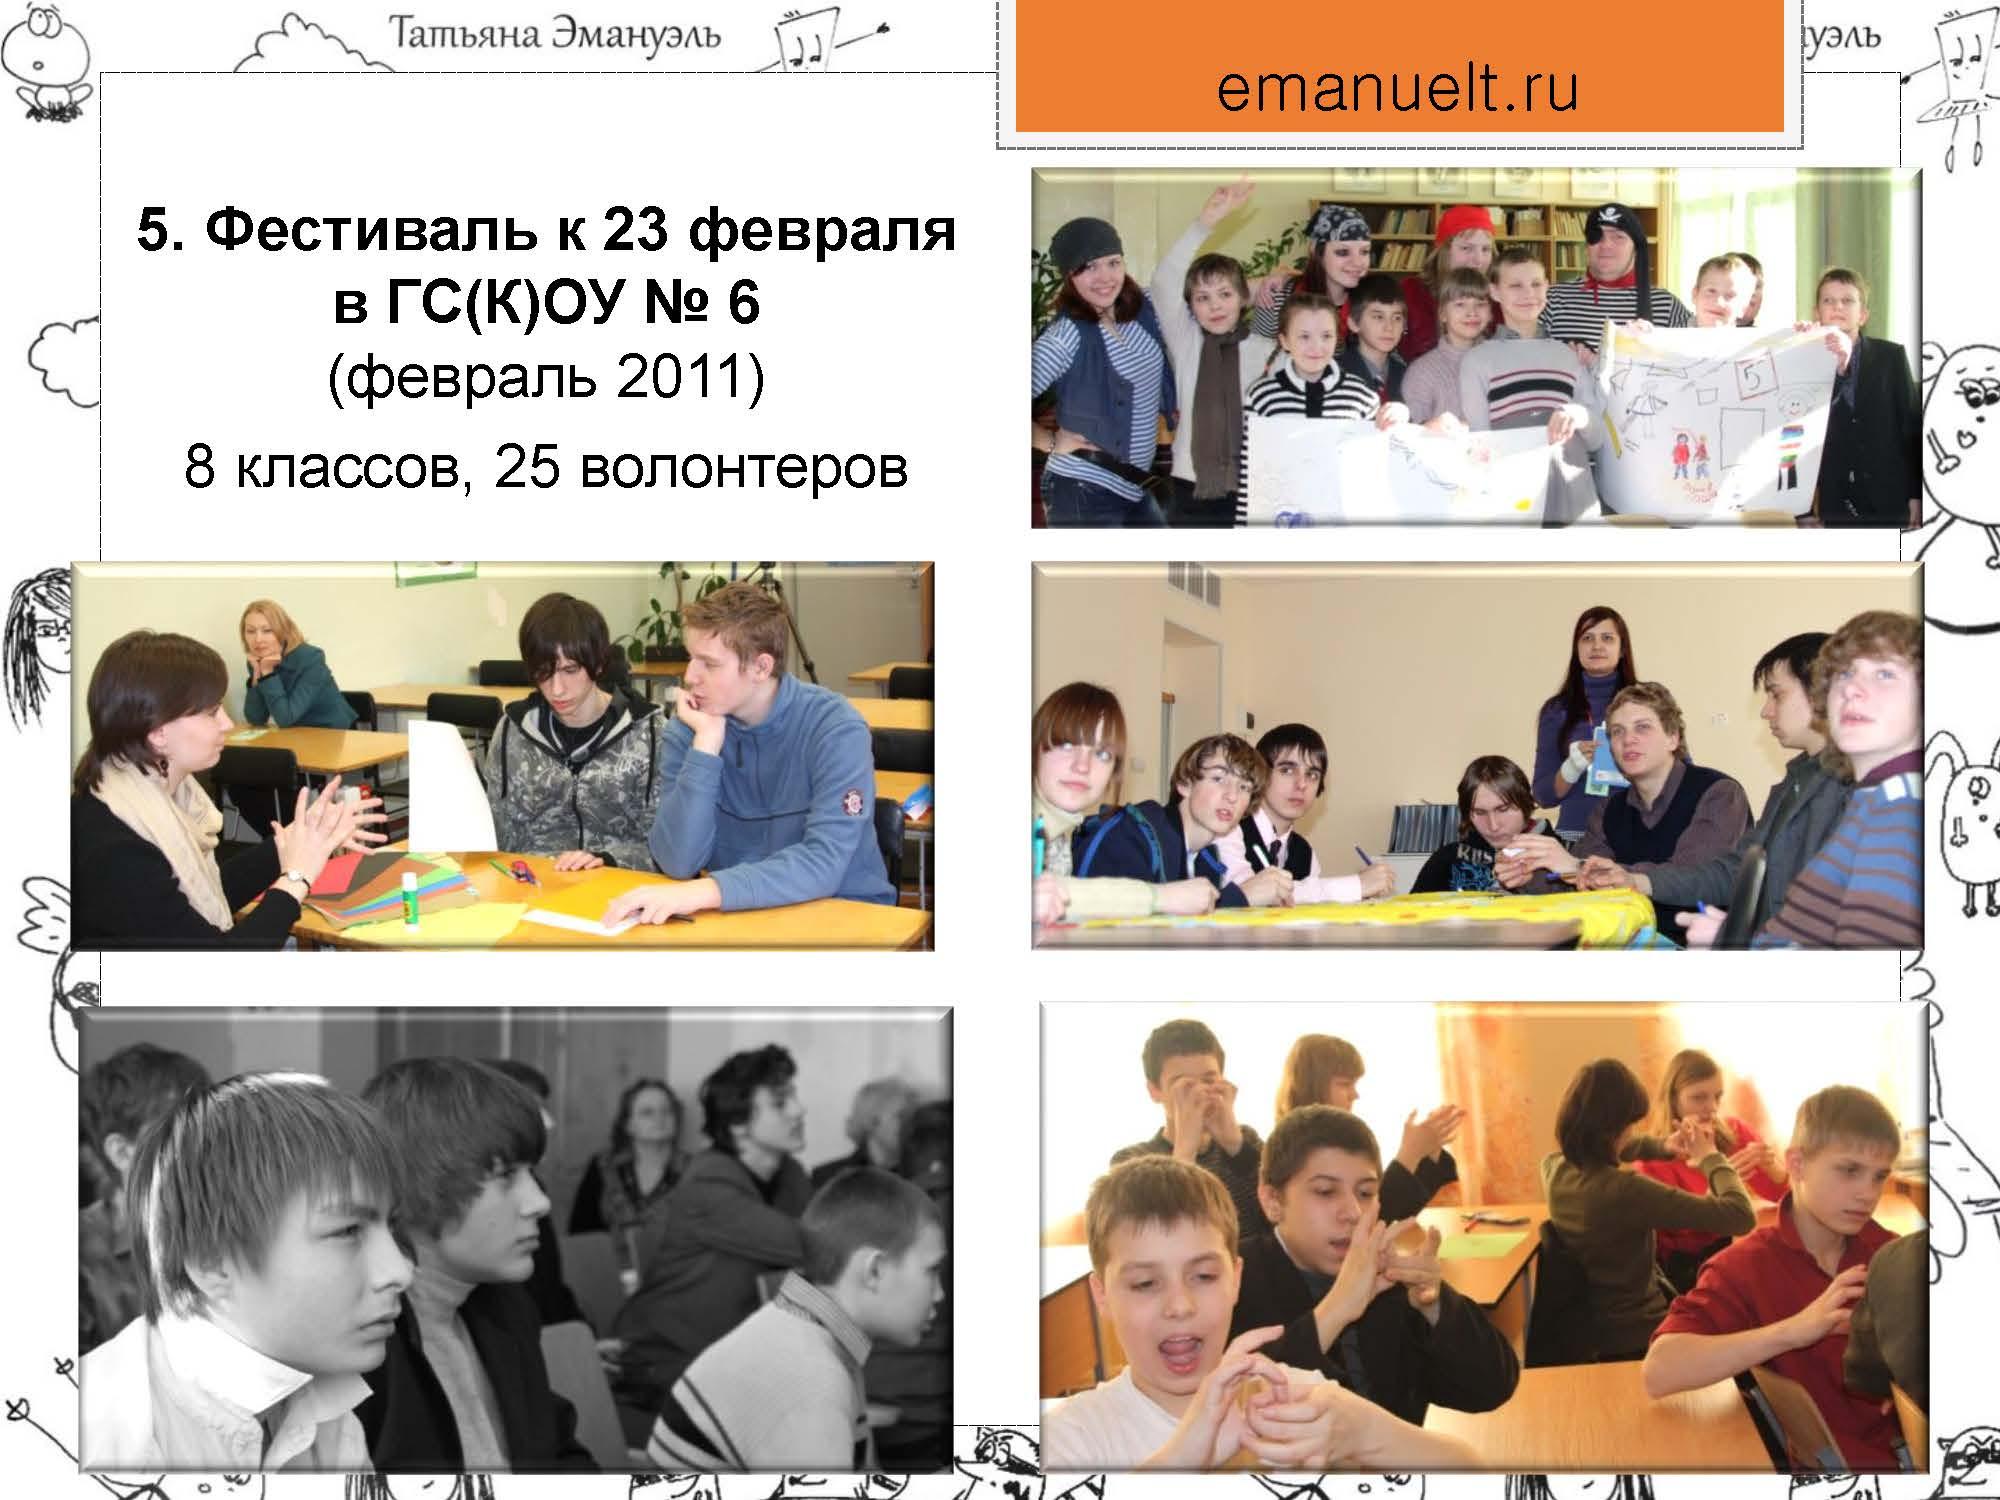 RazBeG_Emanuel_Страница_12